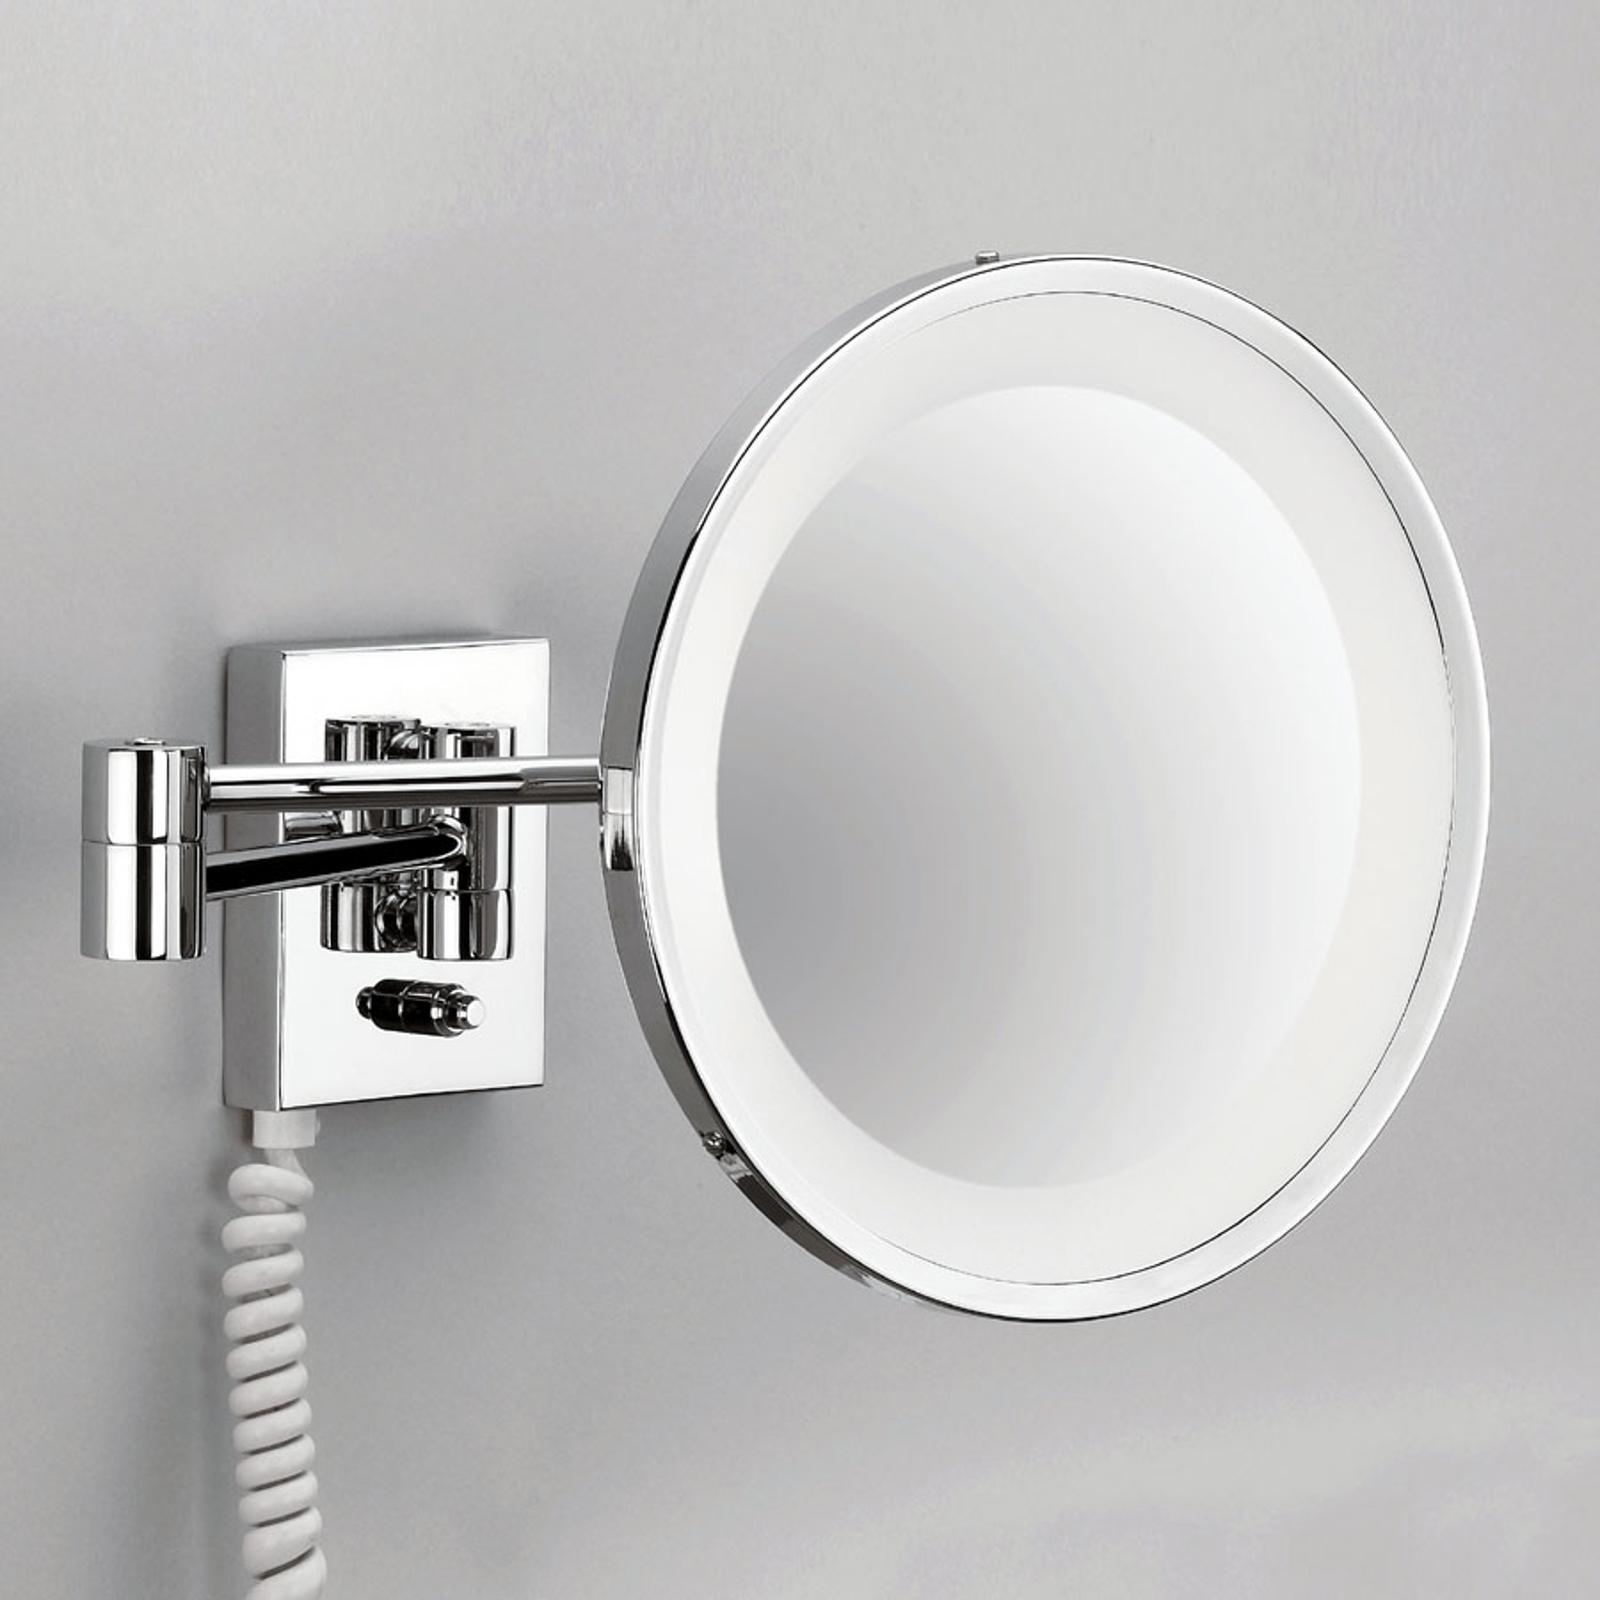 Decor Walther Point kozmetické zrkadlo osvetlené_2504194_1